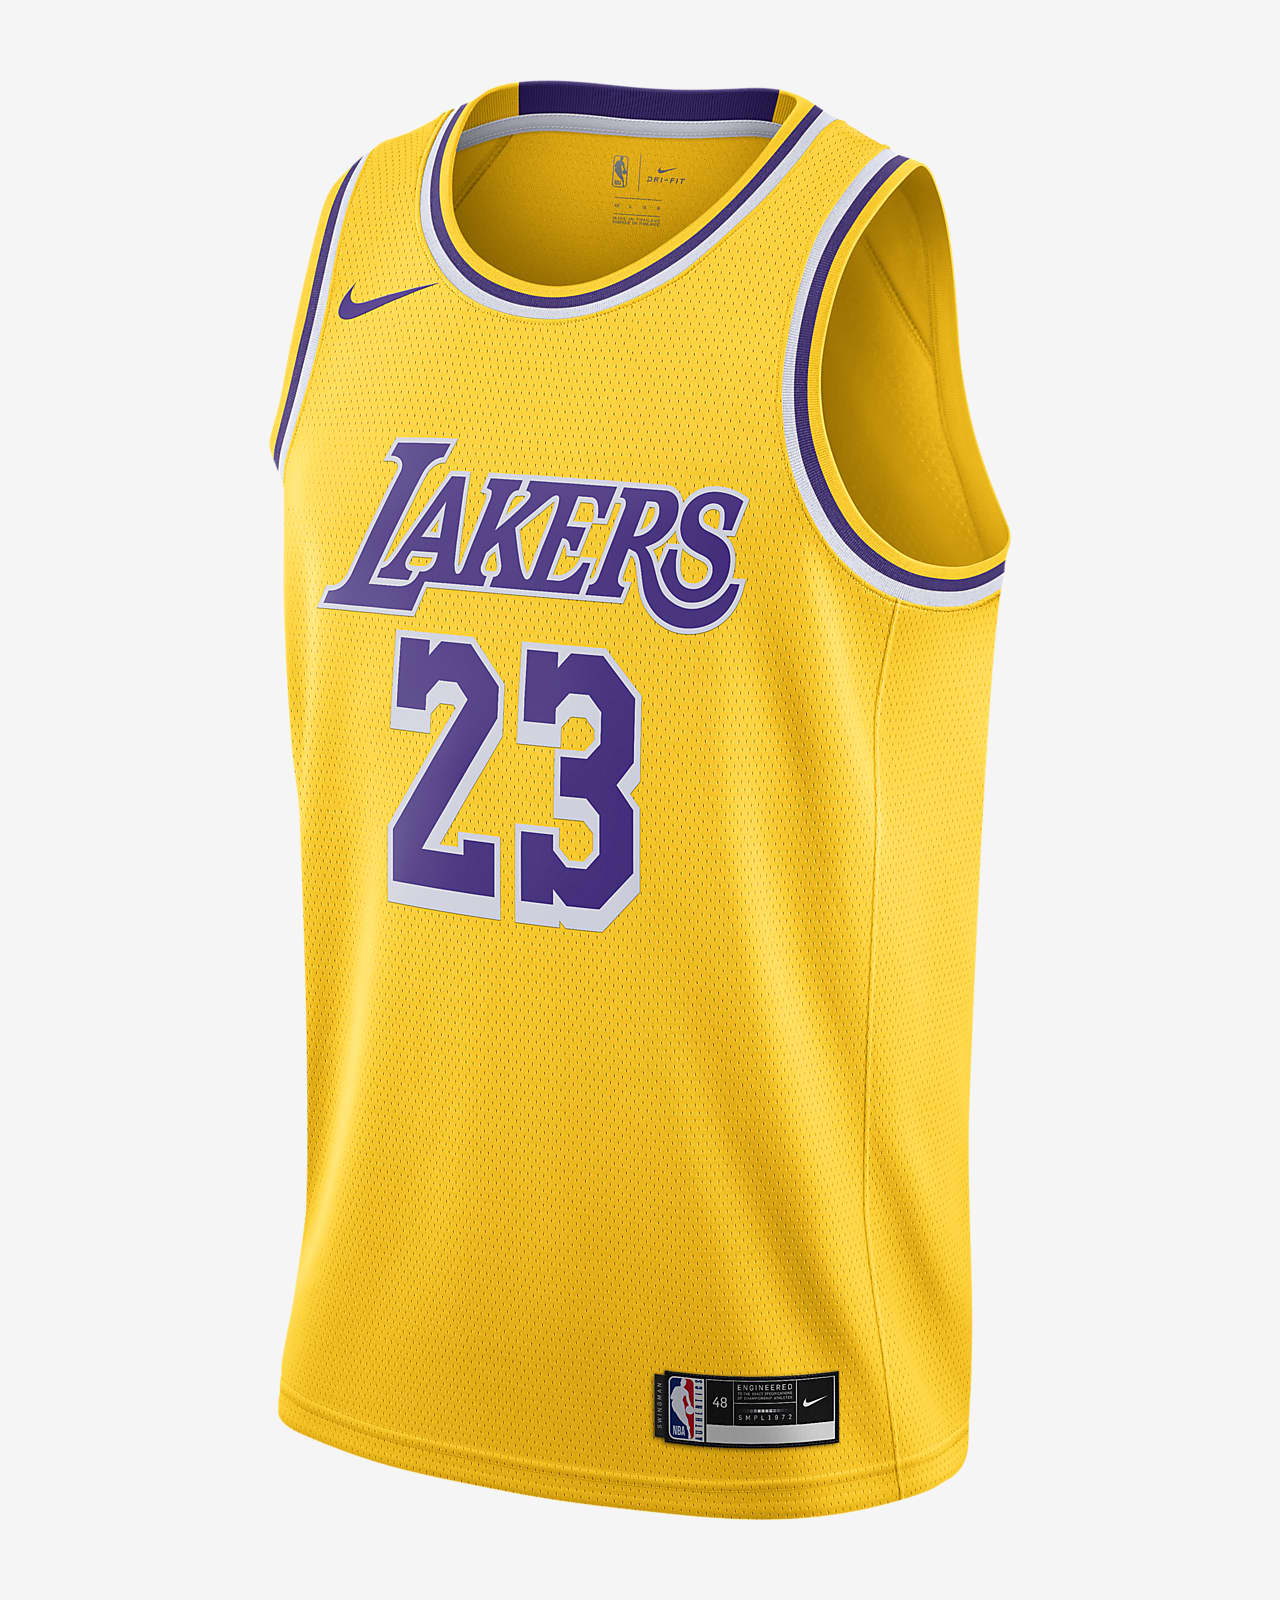 Camiseta Nike NBA Swingman City Edition LeBron James Lakers Icon Edition 2020